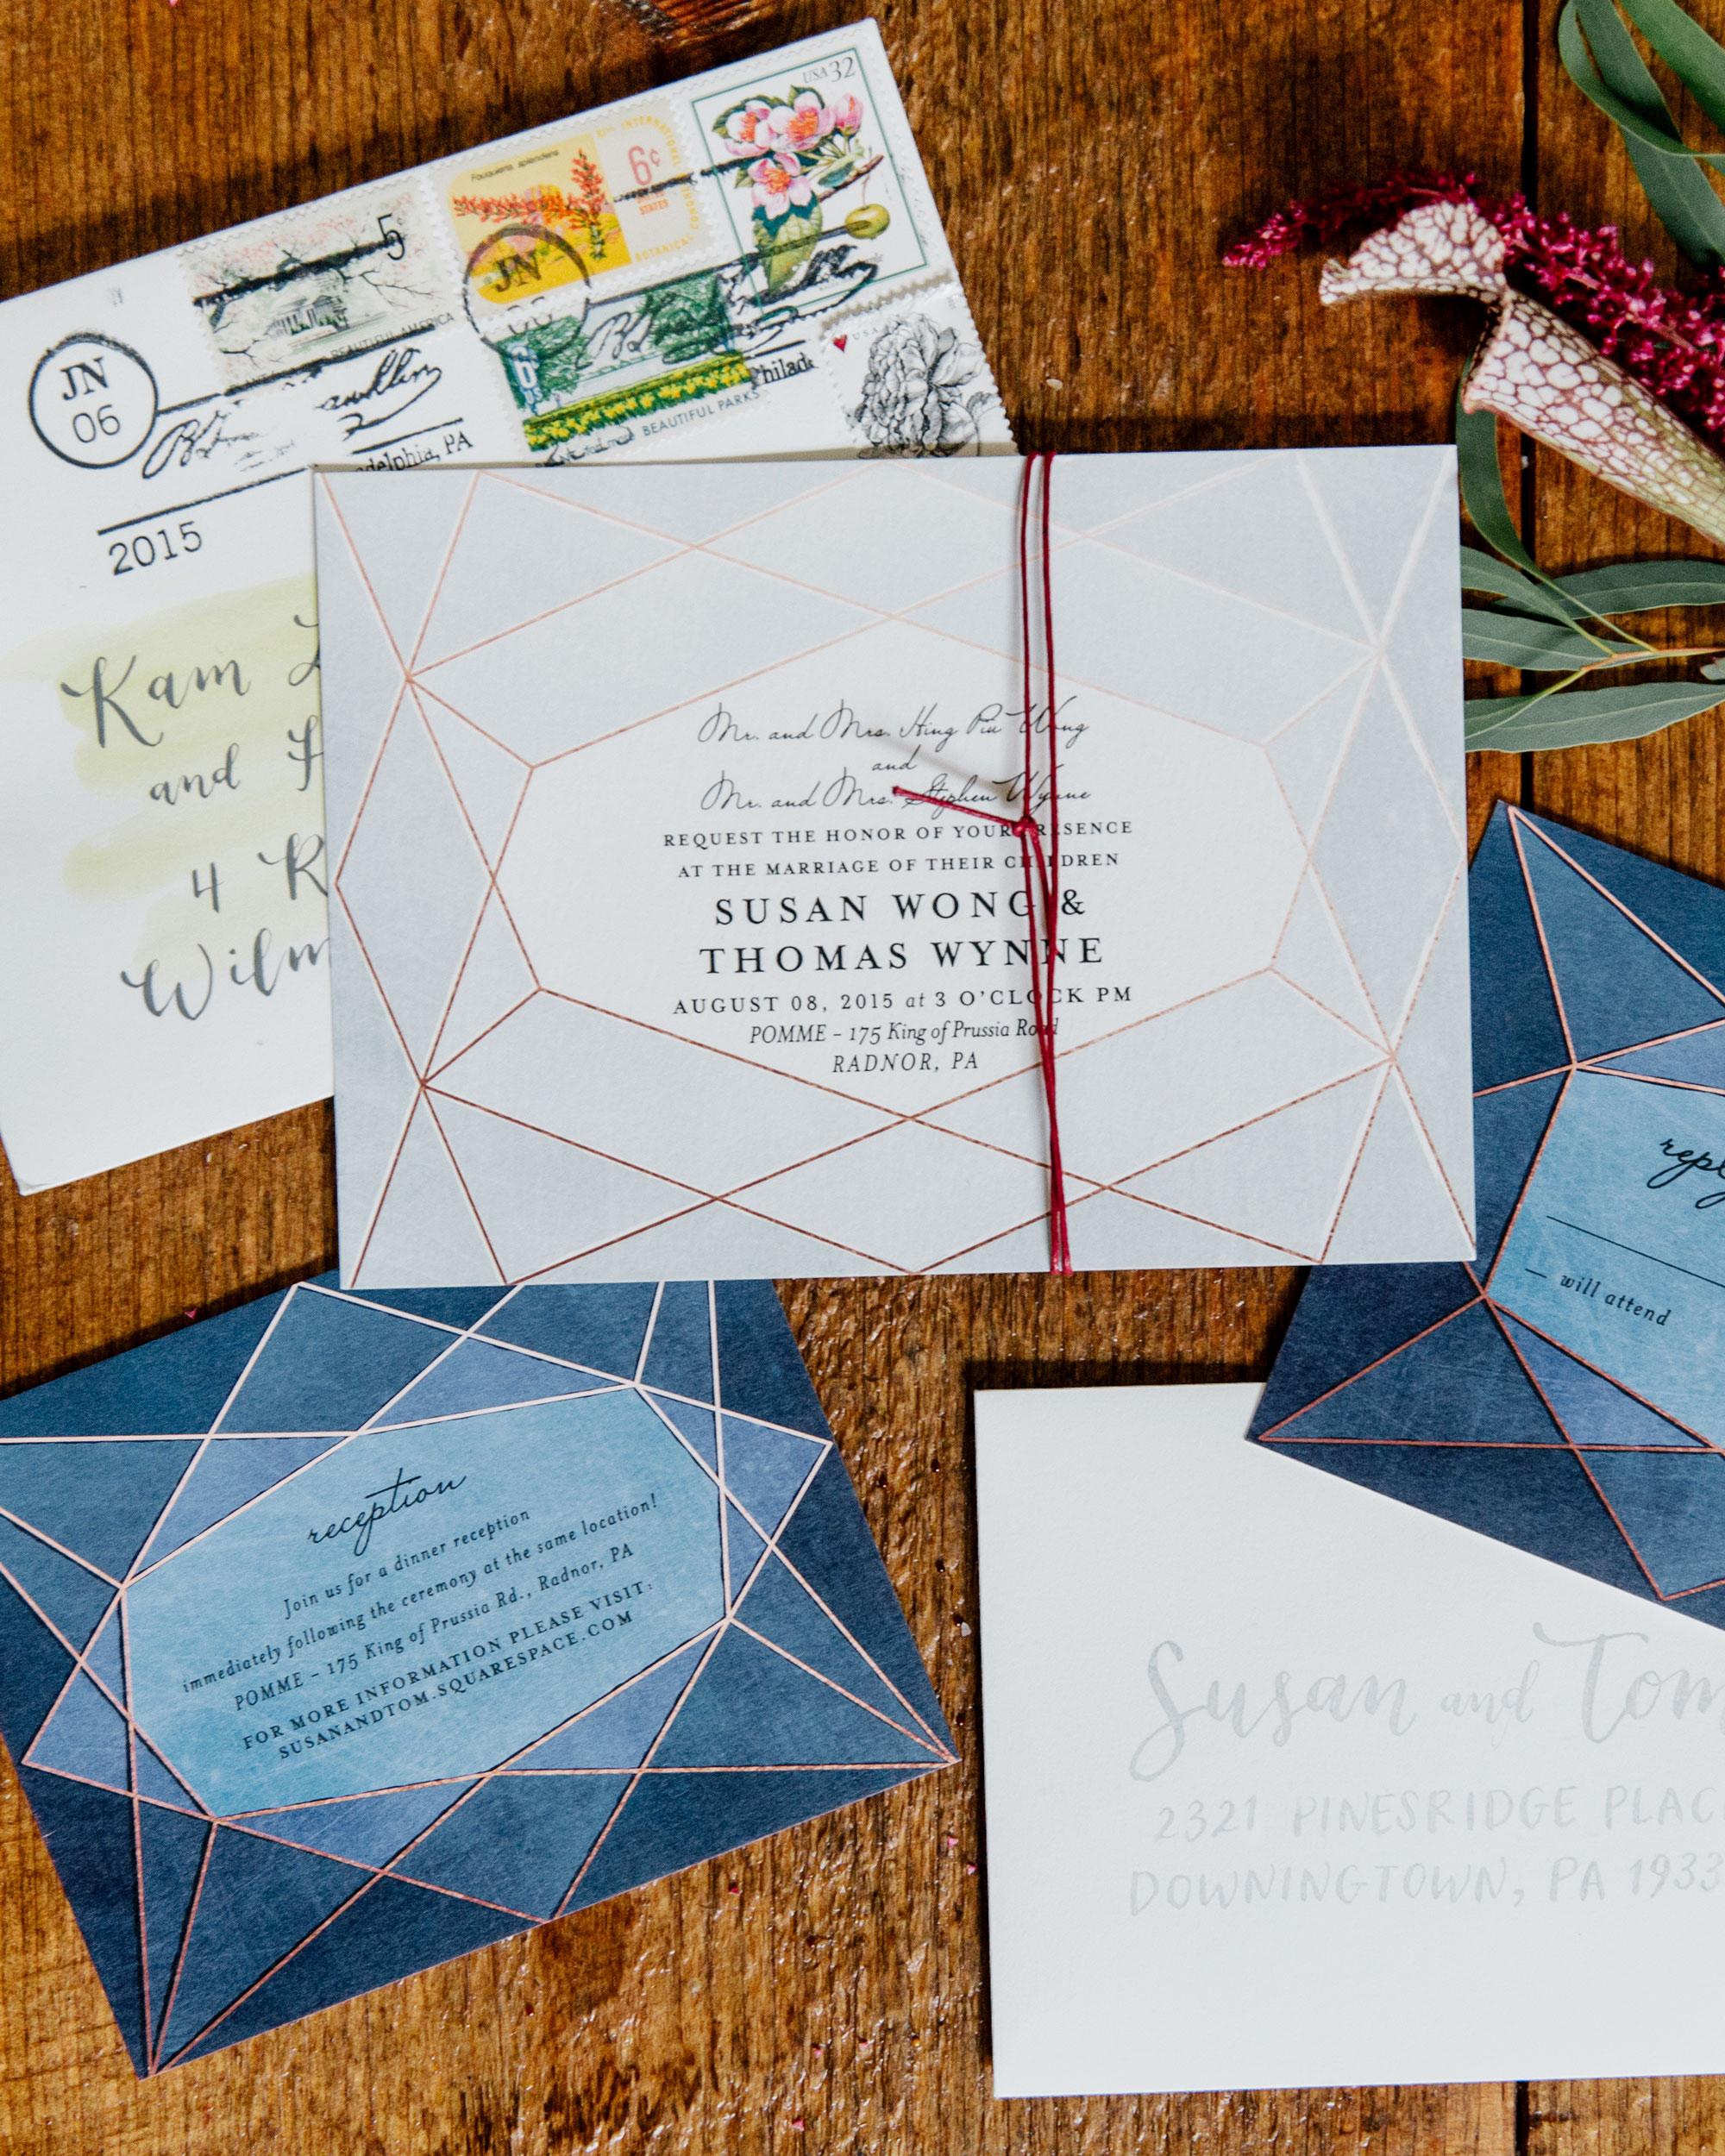 susan-tom-wedding-invite-001-s112692-0316.jpg